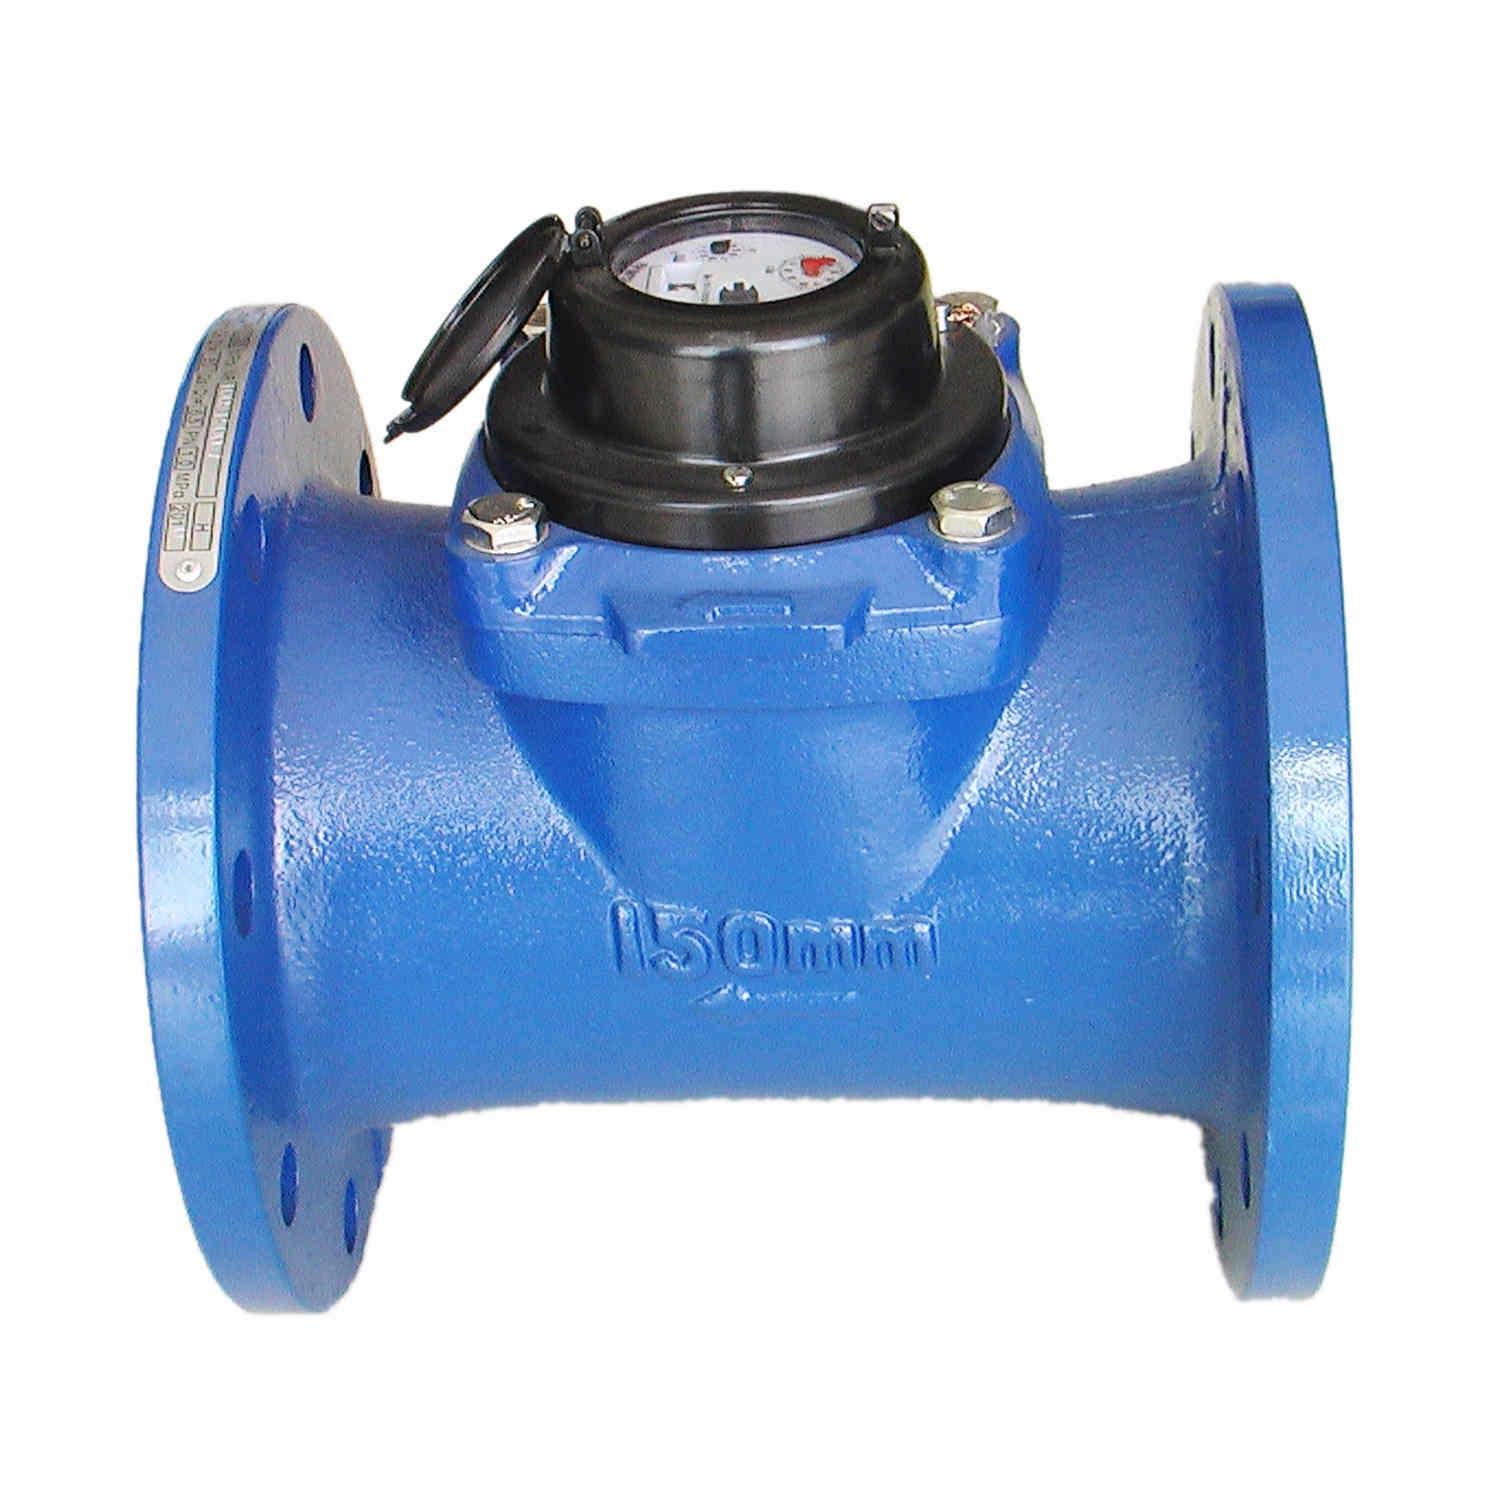 Digital Water Meter : Woltman water meter from shandong guanxiang co ltd